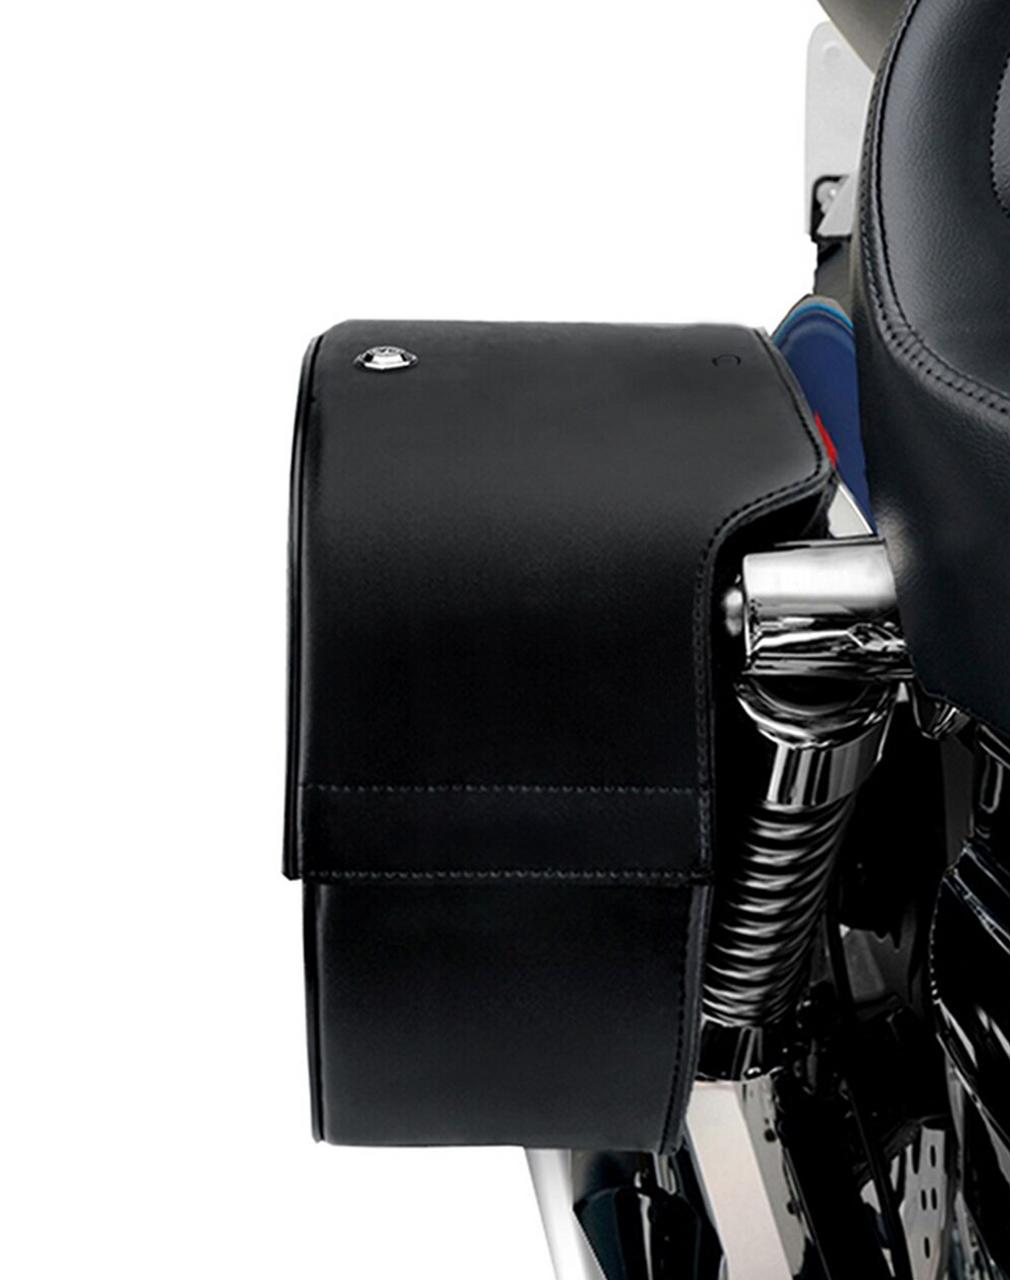 Kawasaki Vulcan 750 Single Strap Shock Cutout Slanted Large Motorcycle Saddlebags Shock Cutout View